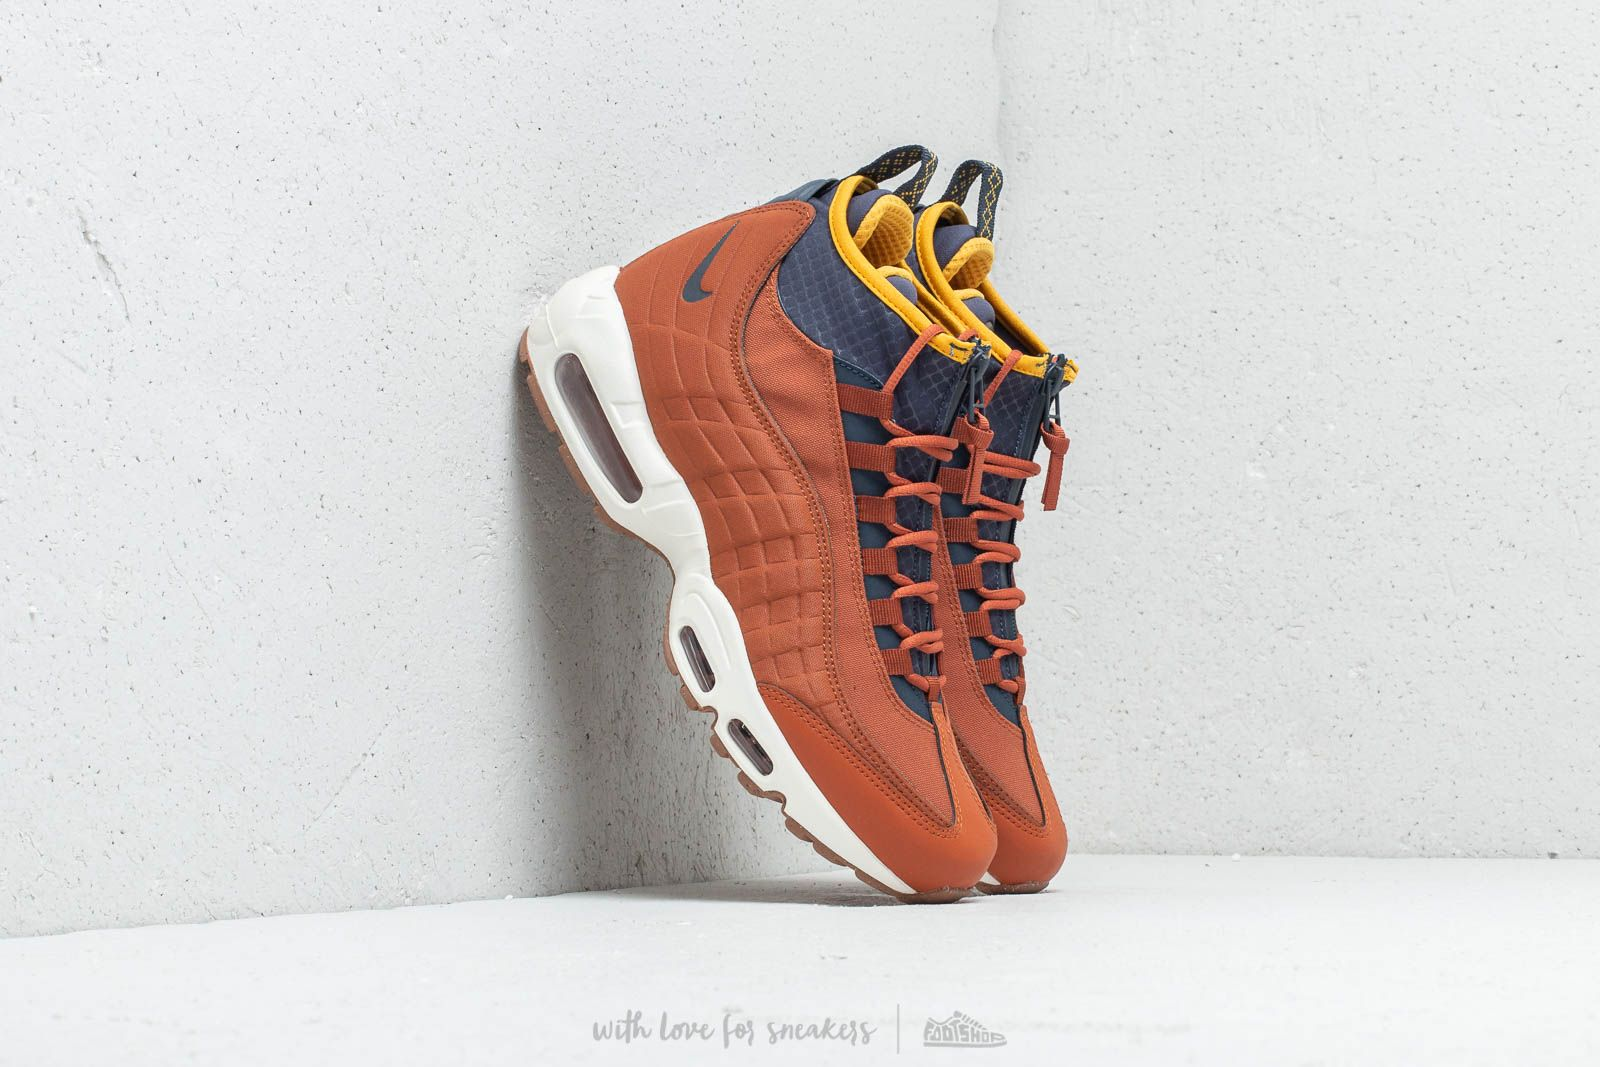 015025106a4510 Nike Air Max 95 Sneakerboot Dark Russet  Thunder Blue